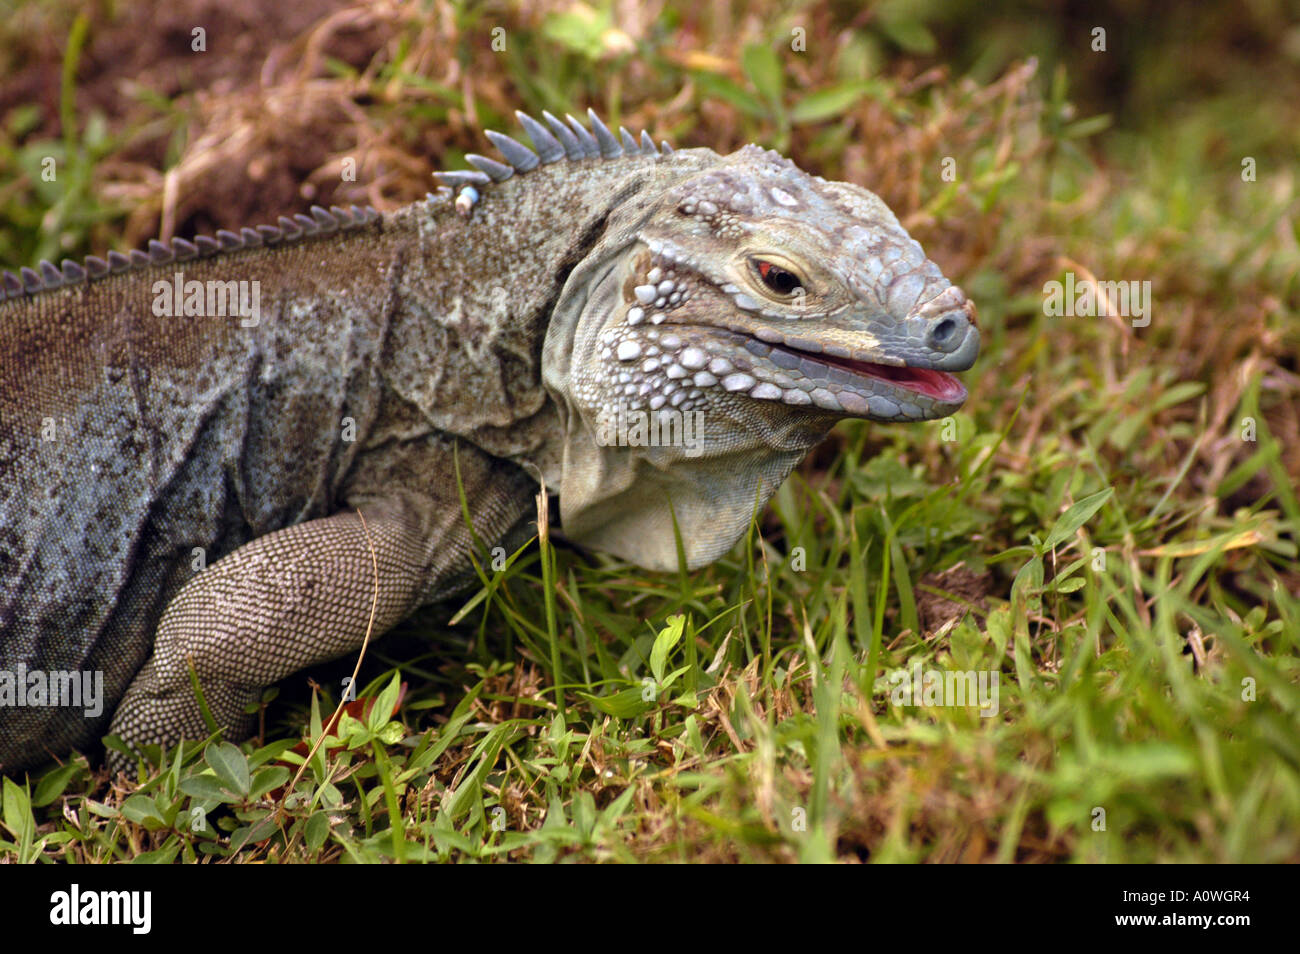 Caribbean Animals: Blue Iguana And Cayman Islands Stock Photos & Blue Iguana